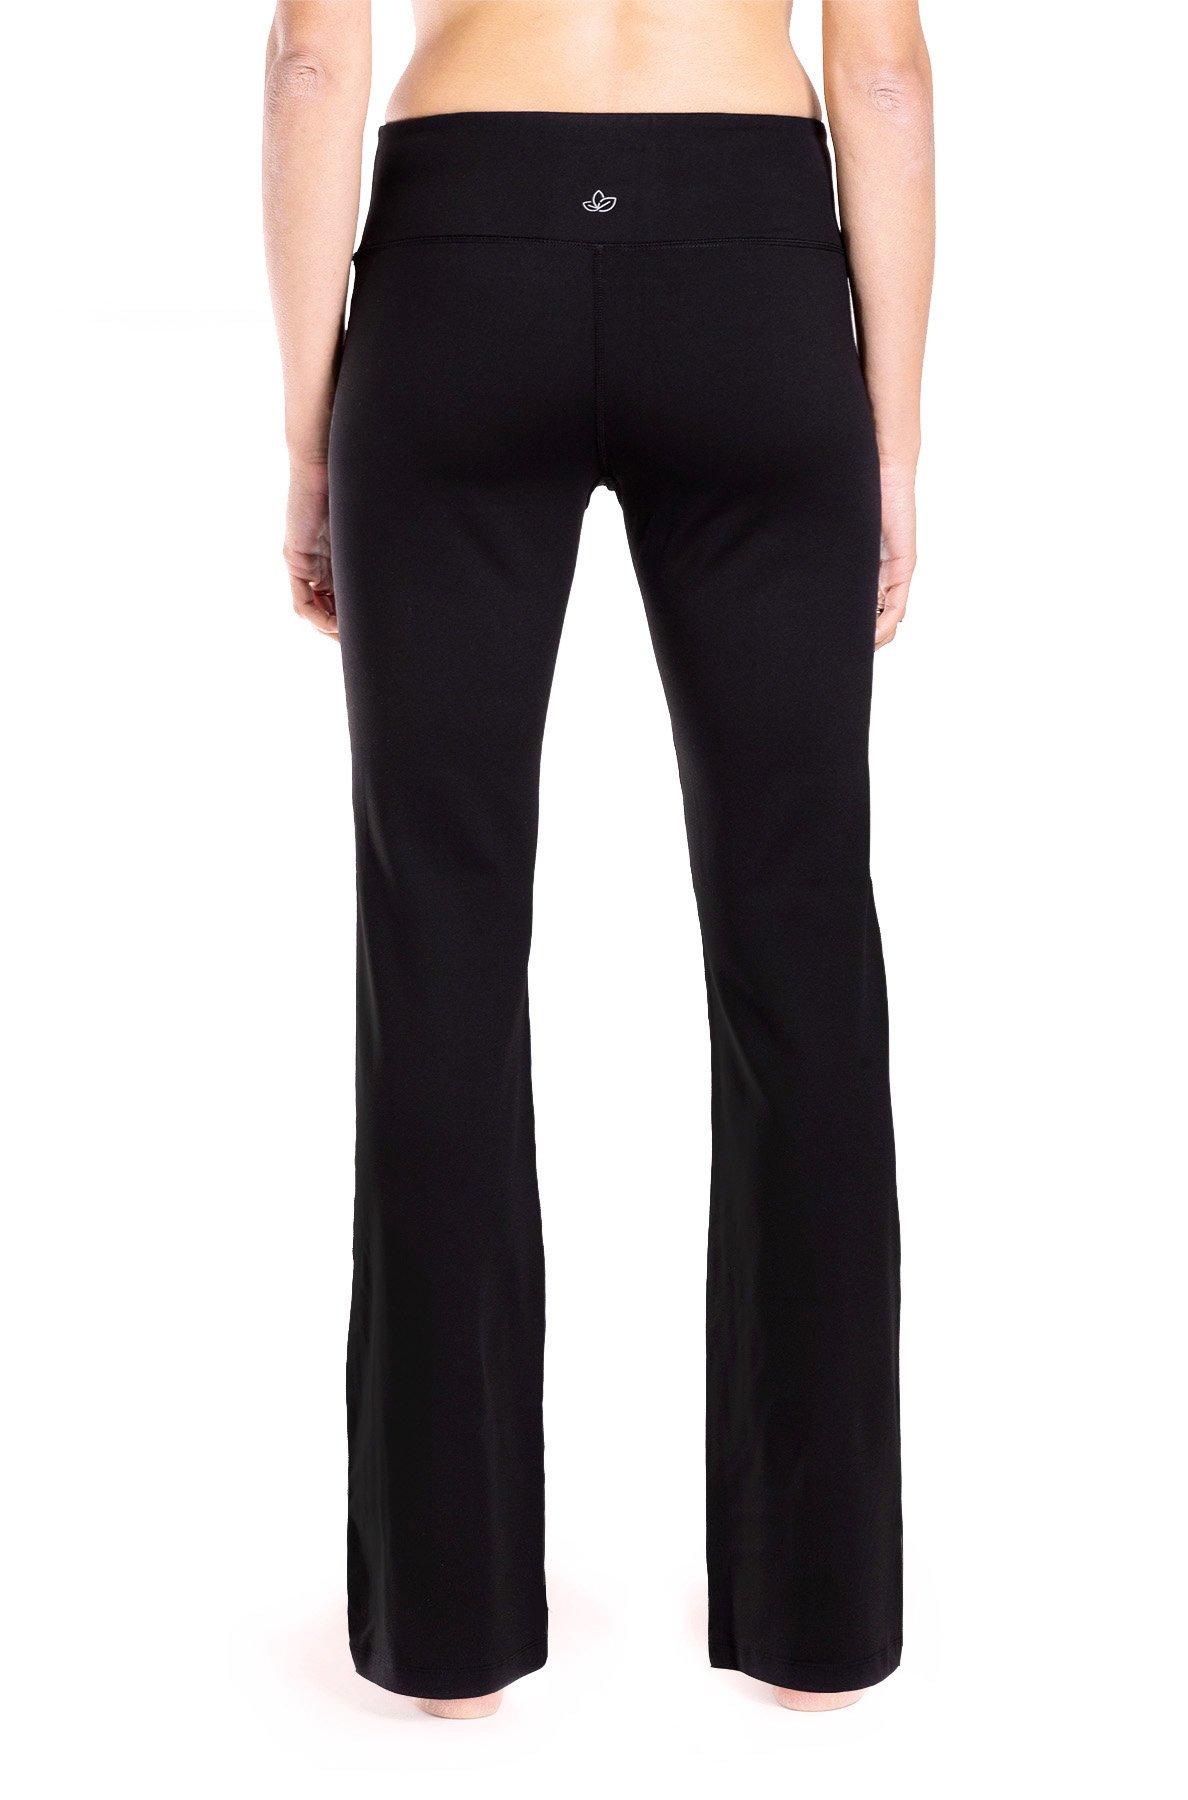 Yogipace 27''/28''/29''/30''/31''/32''/33''/35''/37'' Inseam,Petite/Regular/Tall, Women's Bootcut Yoga Pants Long Workout Pants, 29'', Black Size XS by Yogipace (Image #4)